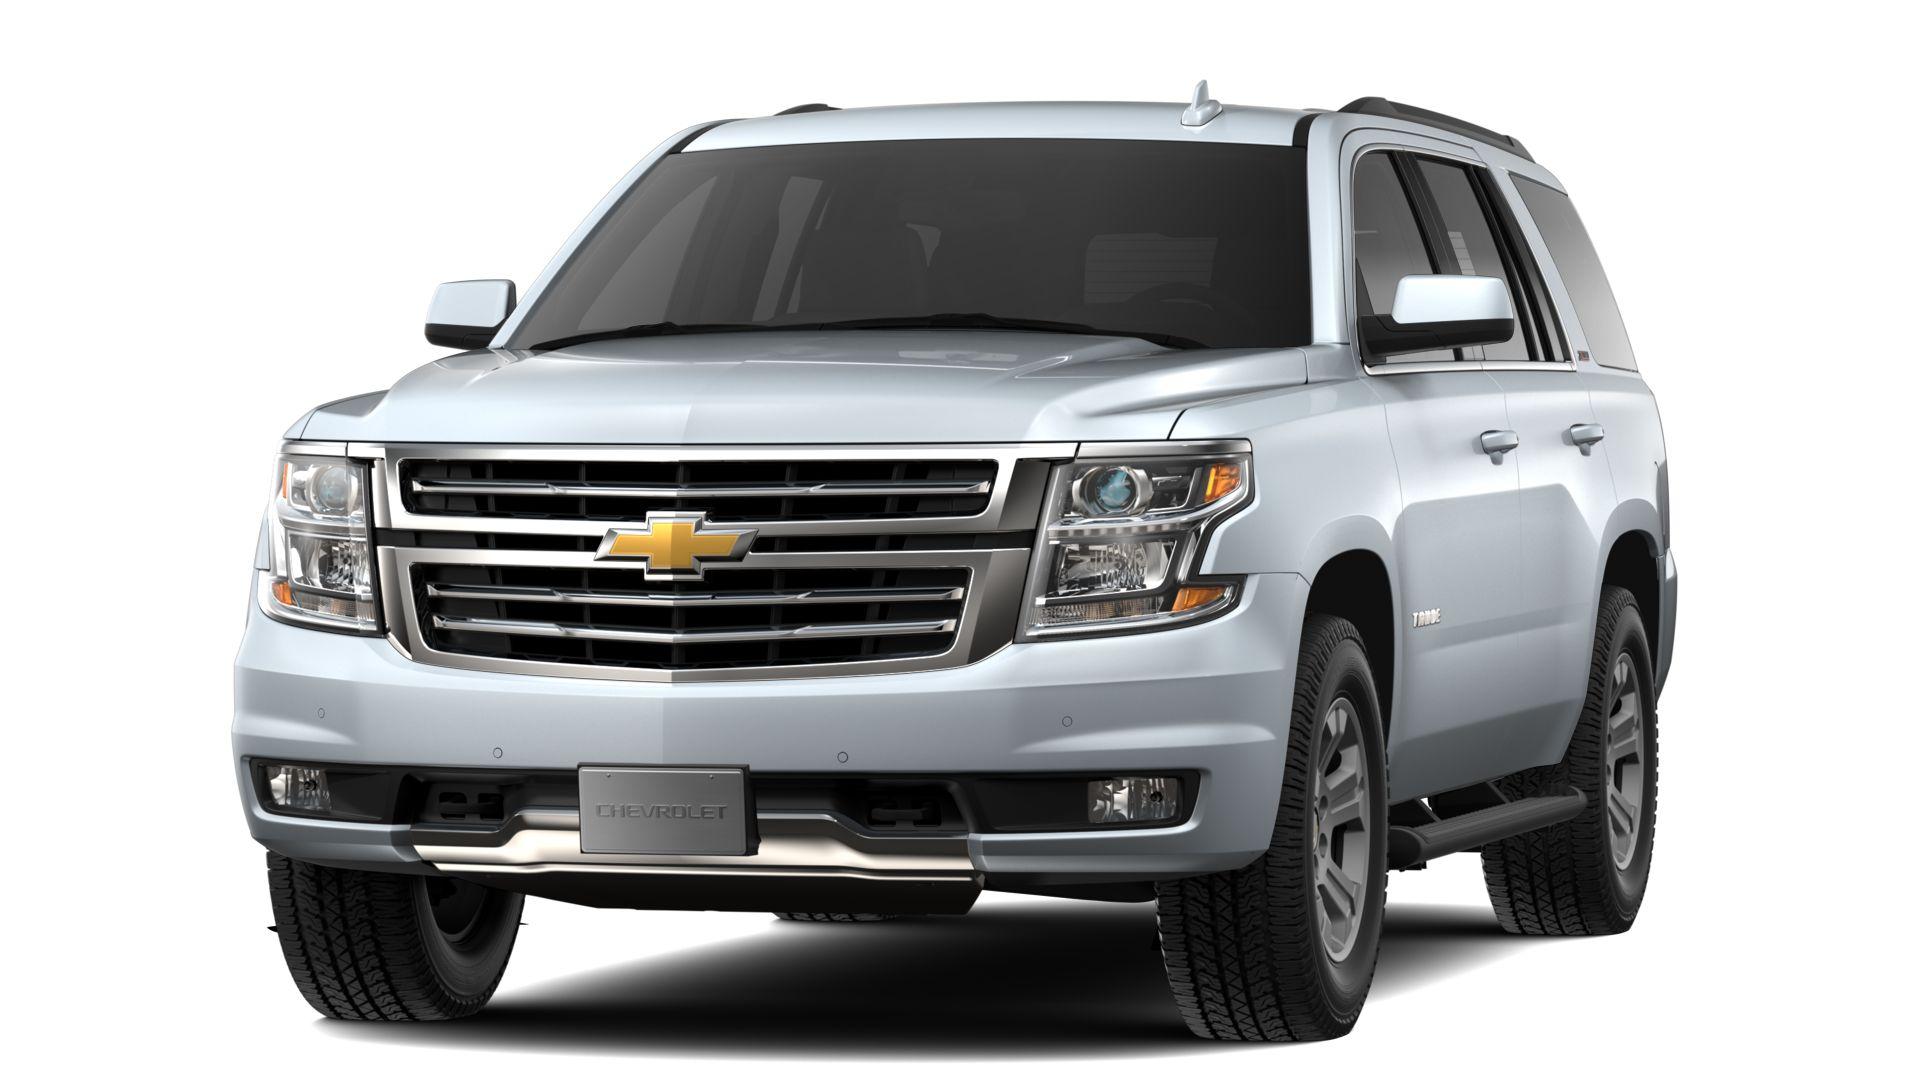 New 2019 Chevrolet Tahoe LT SUV in San Antonio #261707 ...